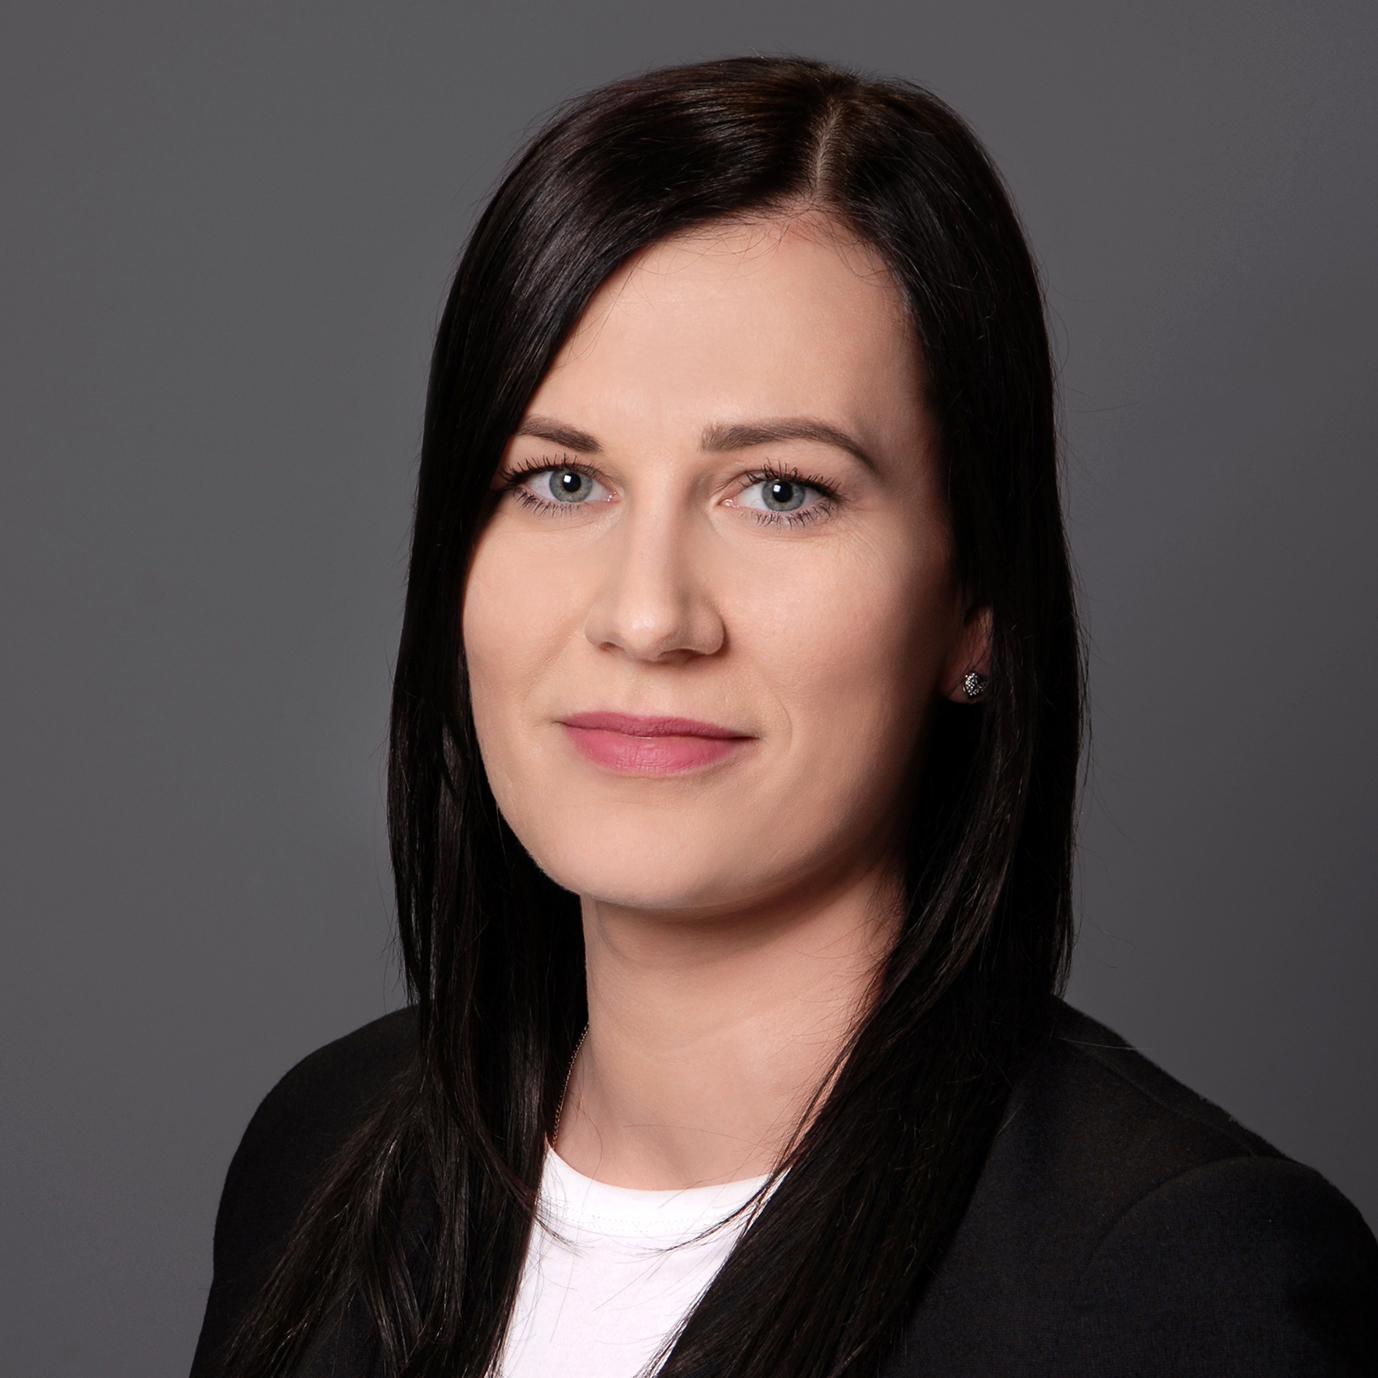 Paulina Pelczyńska–Rybak